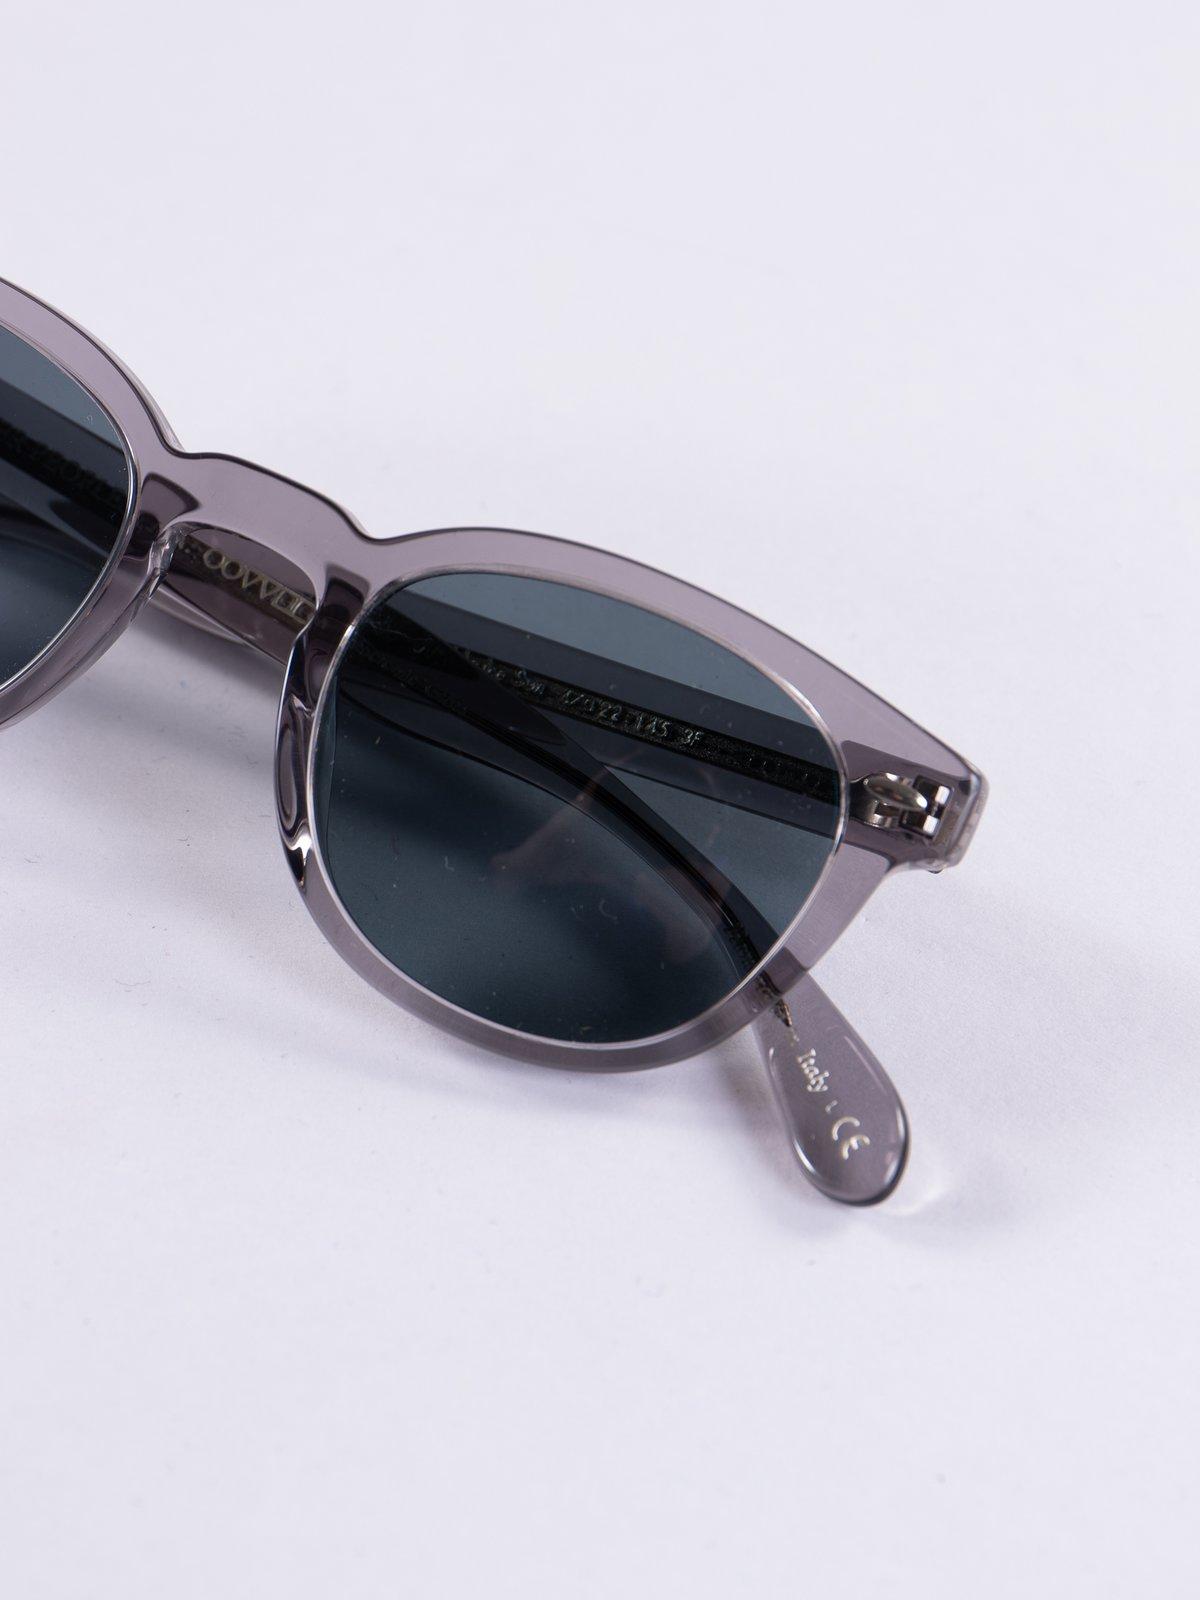 Workman Grey Sheldrake Sunglasses - Image 2